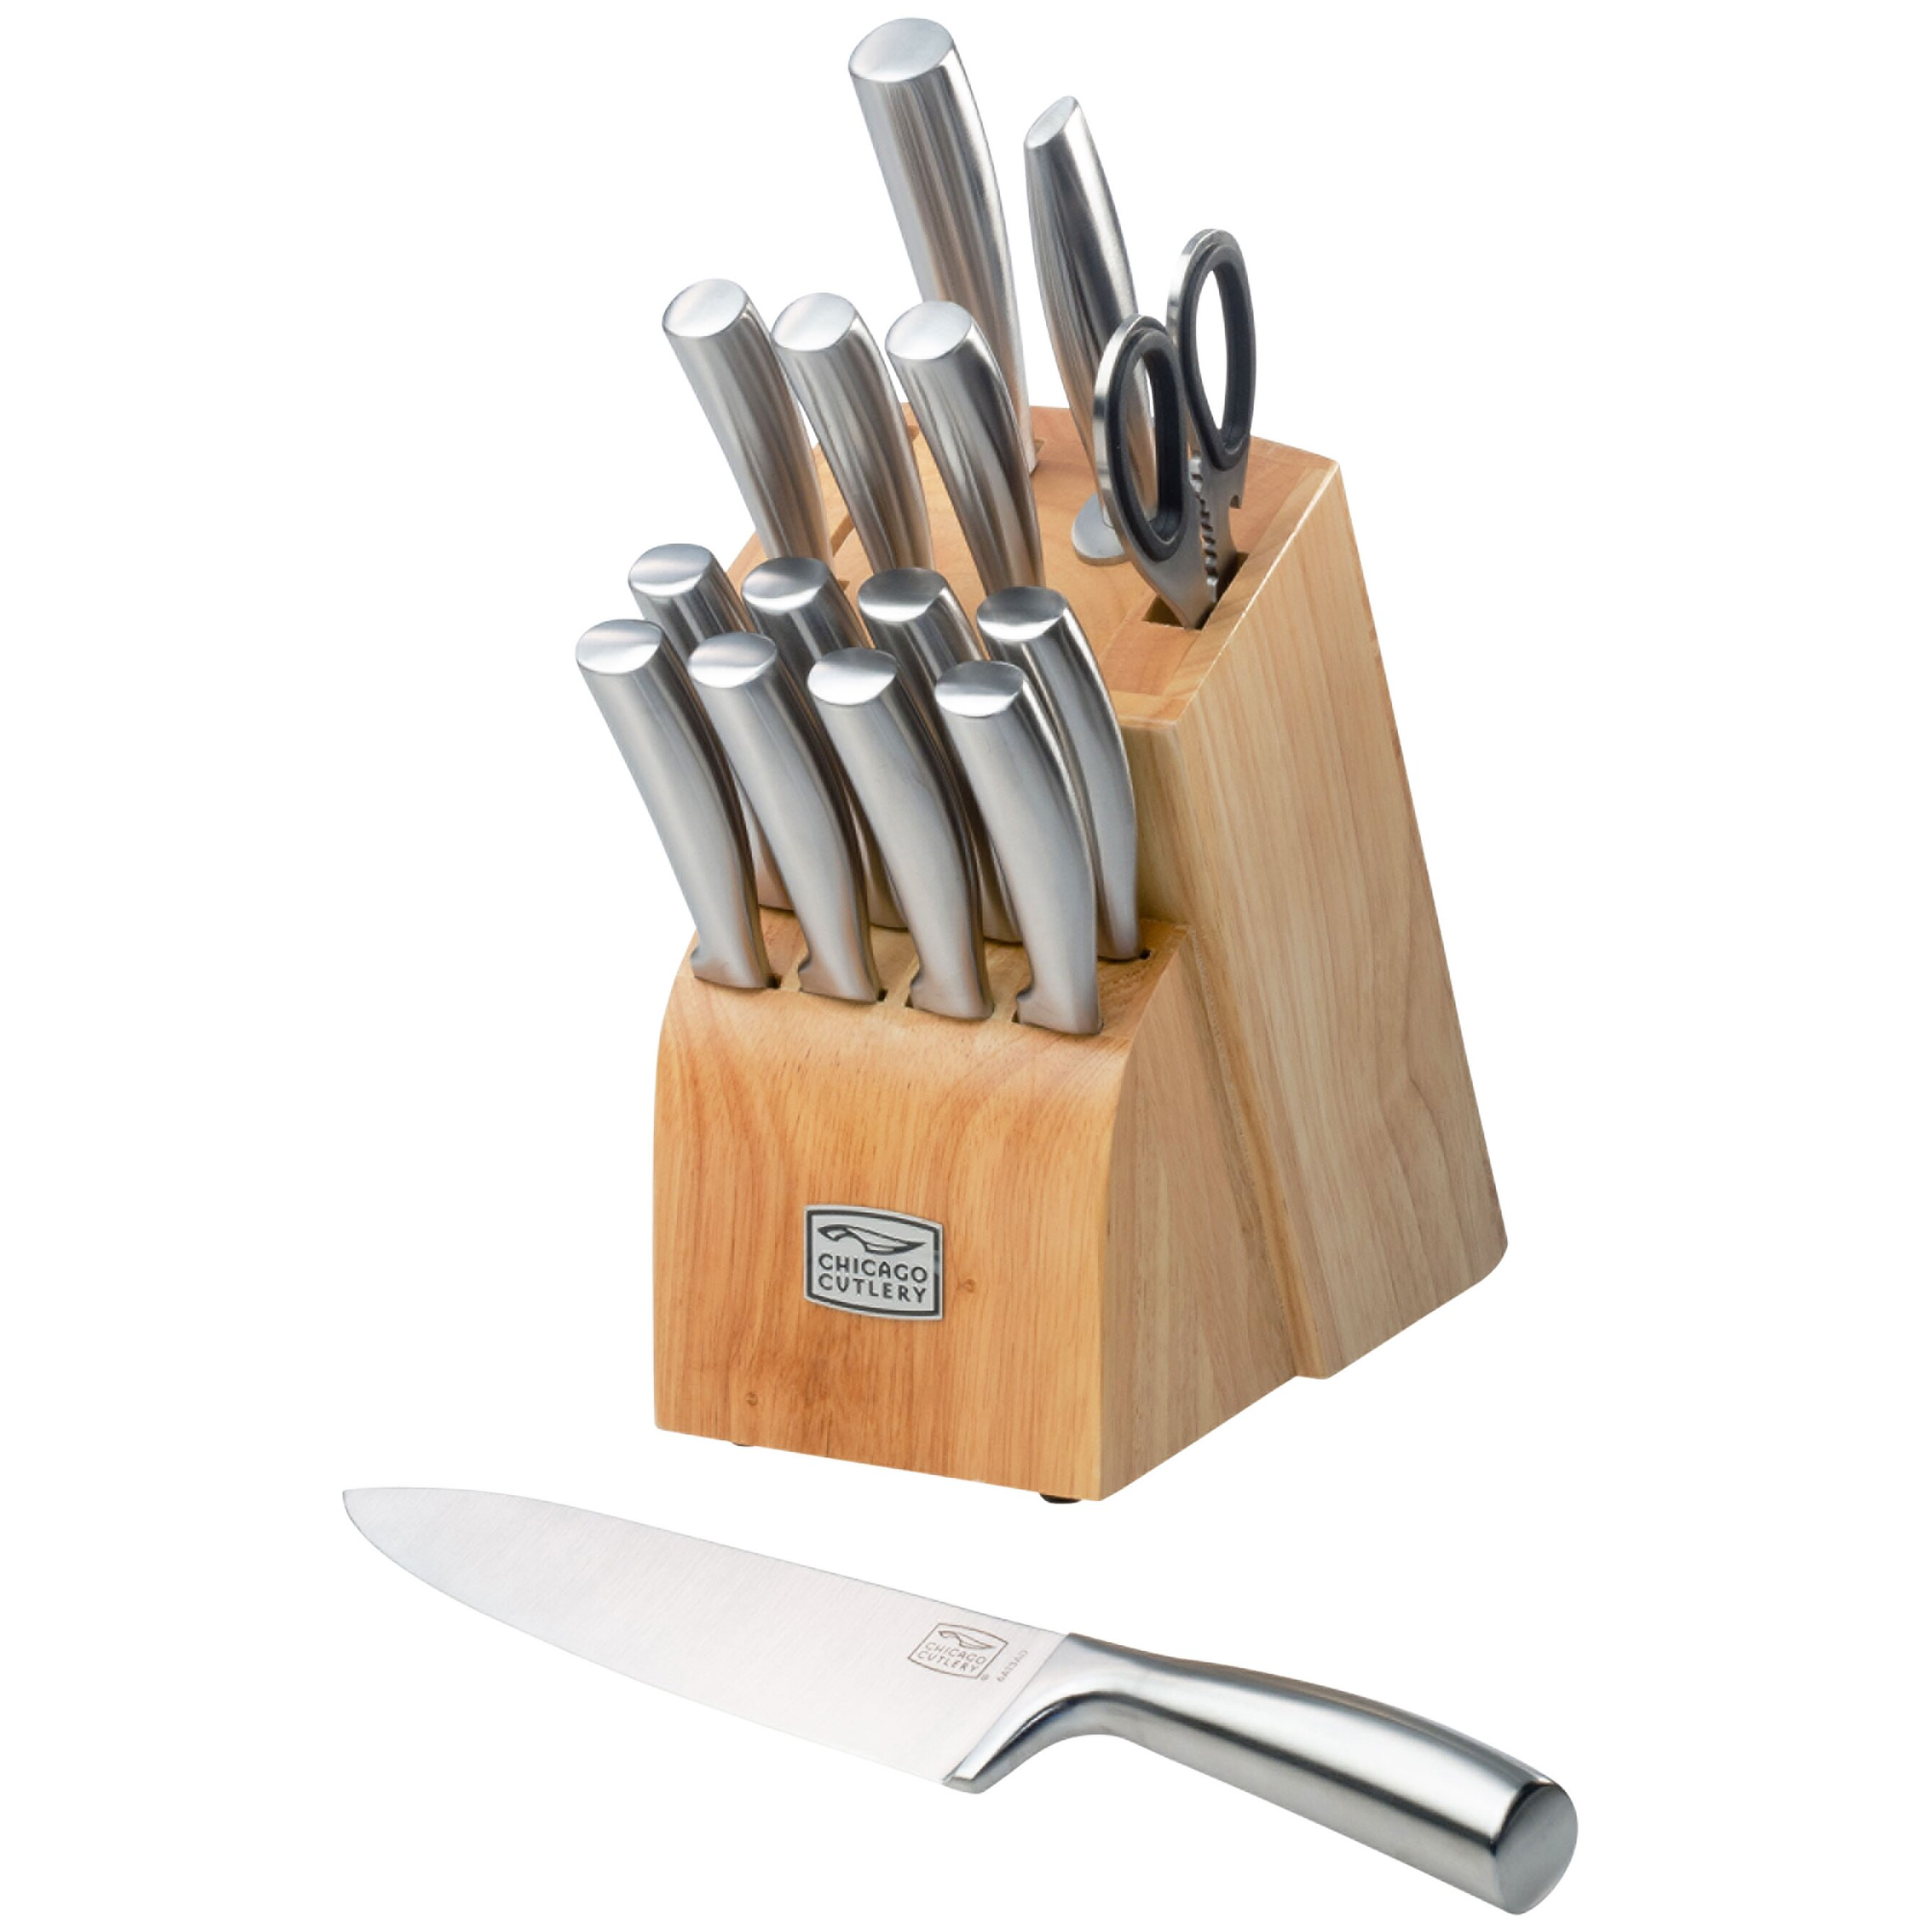 chicago cutlery elston 16 piece block set reviews wayfair. Black Bedroom Furniture Sets. Home Design Ideas